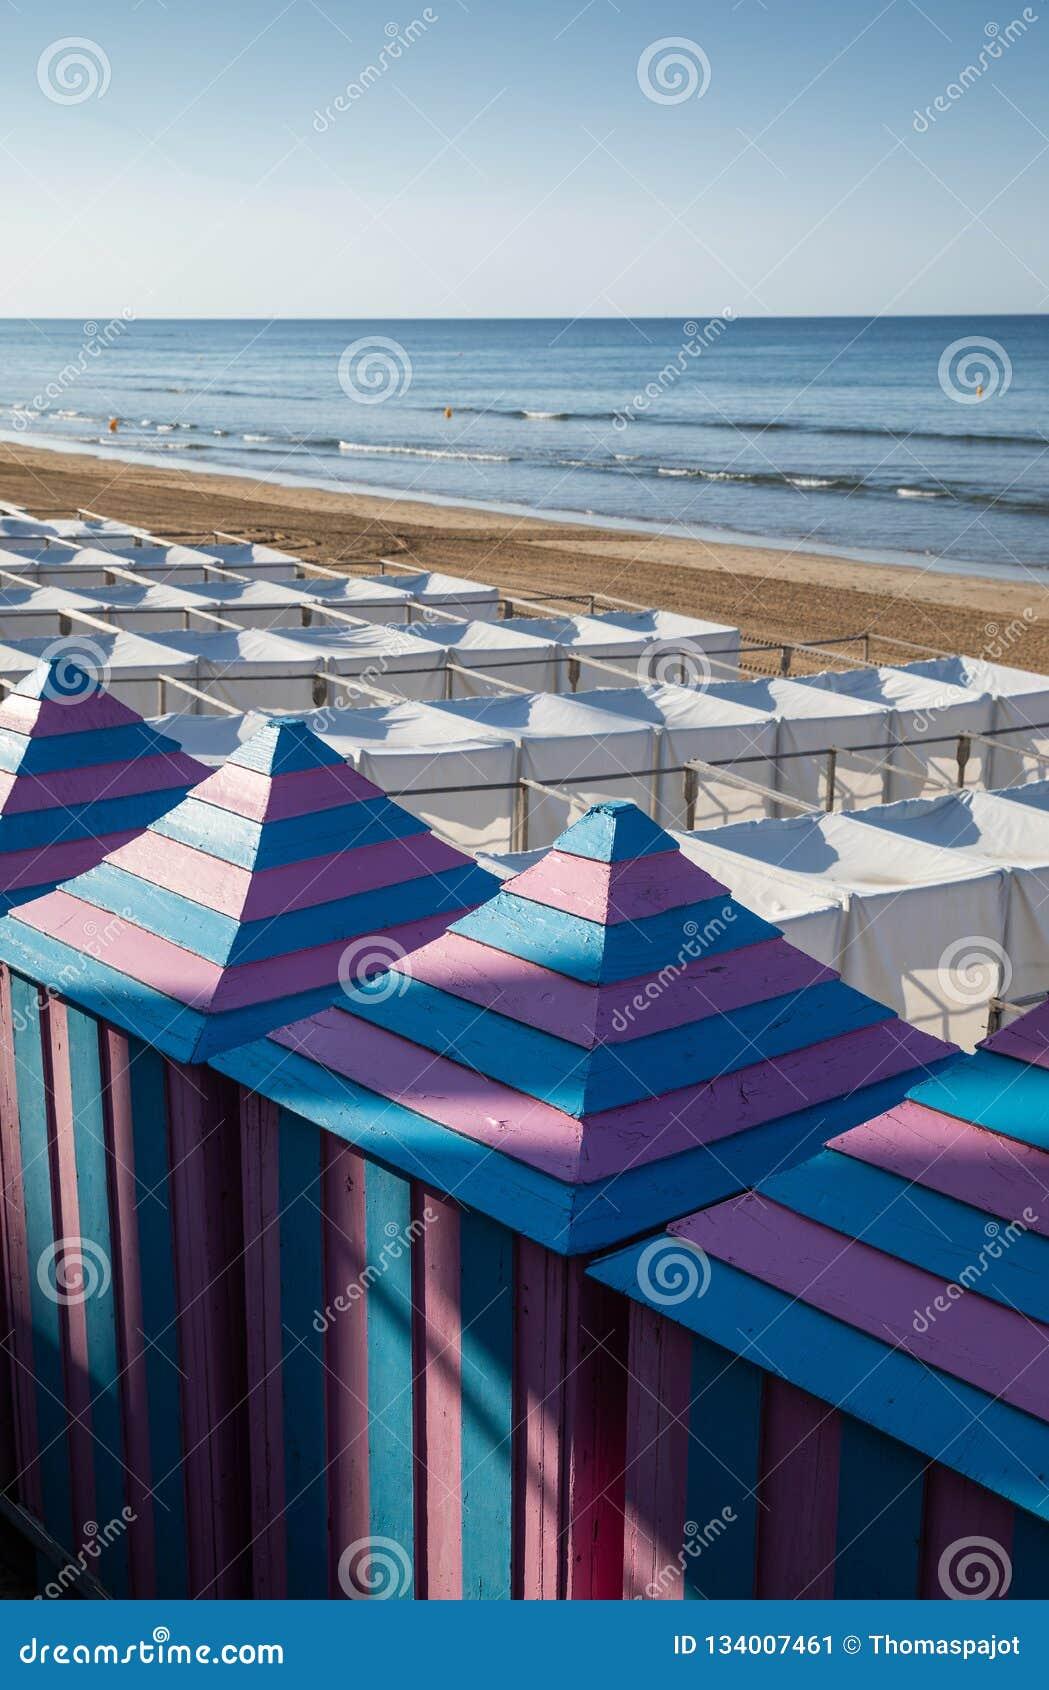 Barracas brancas e cabines cor-de-rosa azuis na praia